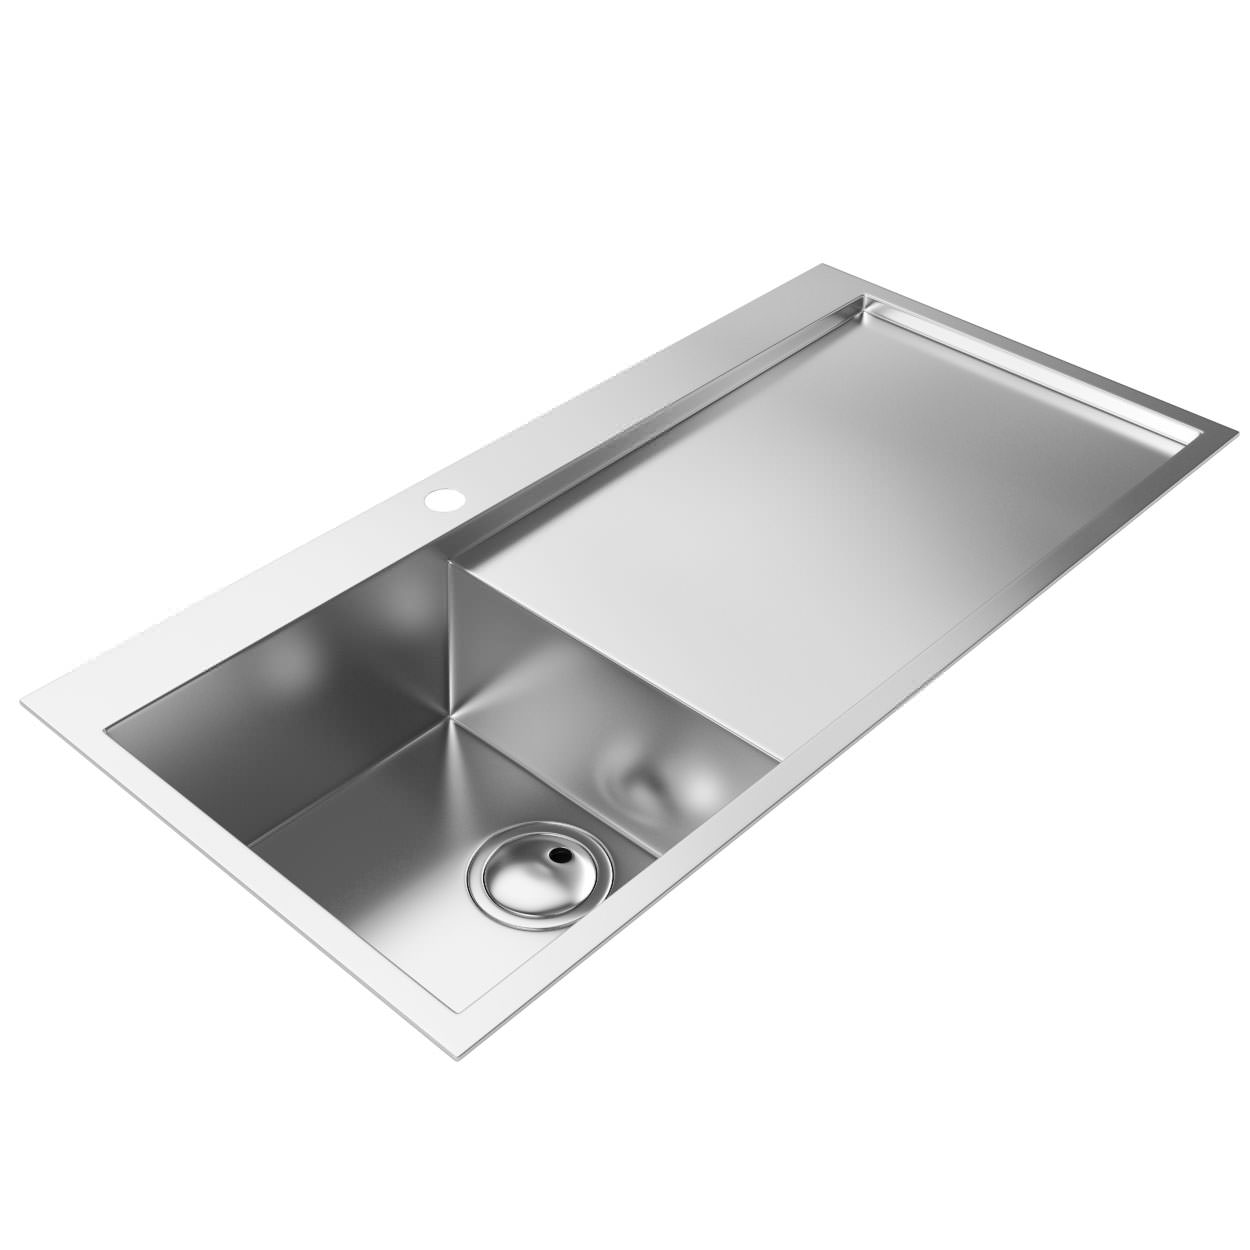 Abode Metrik Stainless Steel Kitchen Sink 1 0 Bowl Right